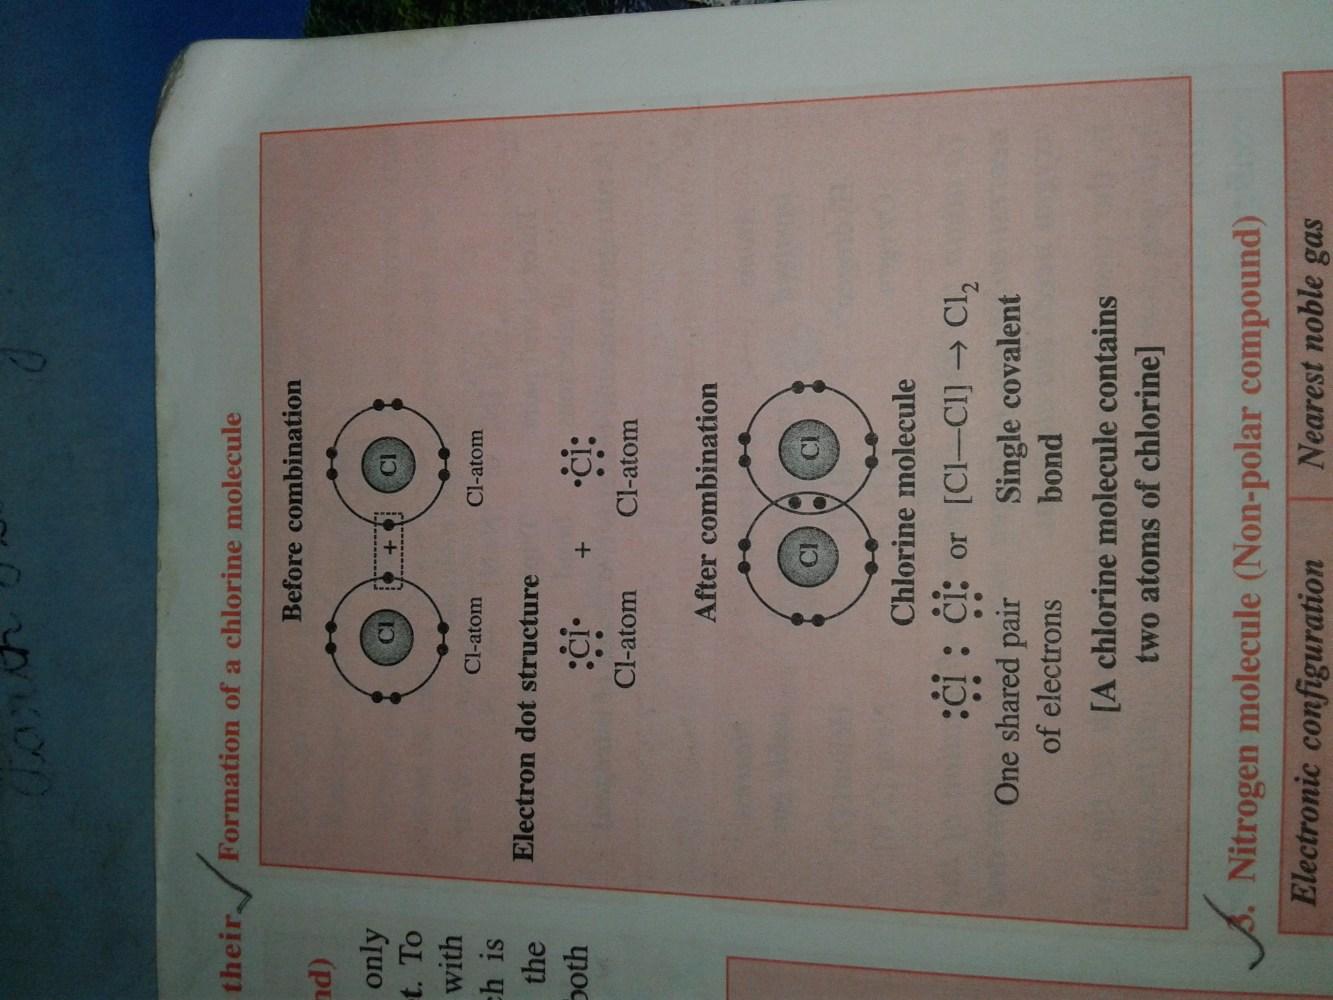 medium resolution of chlorine dot structure